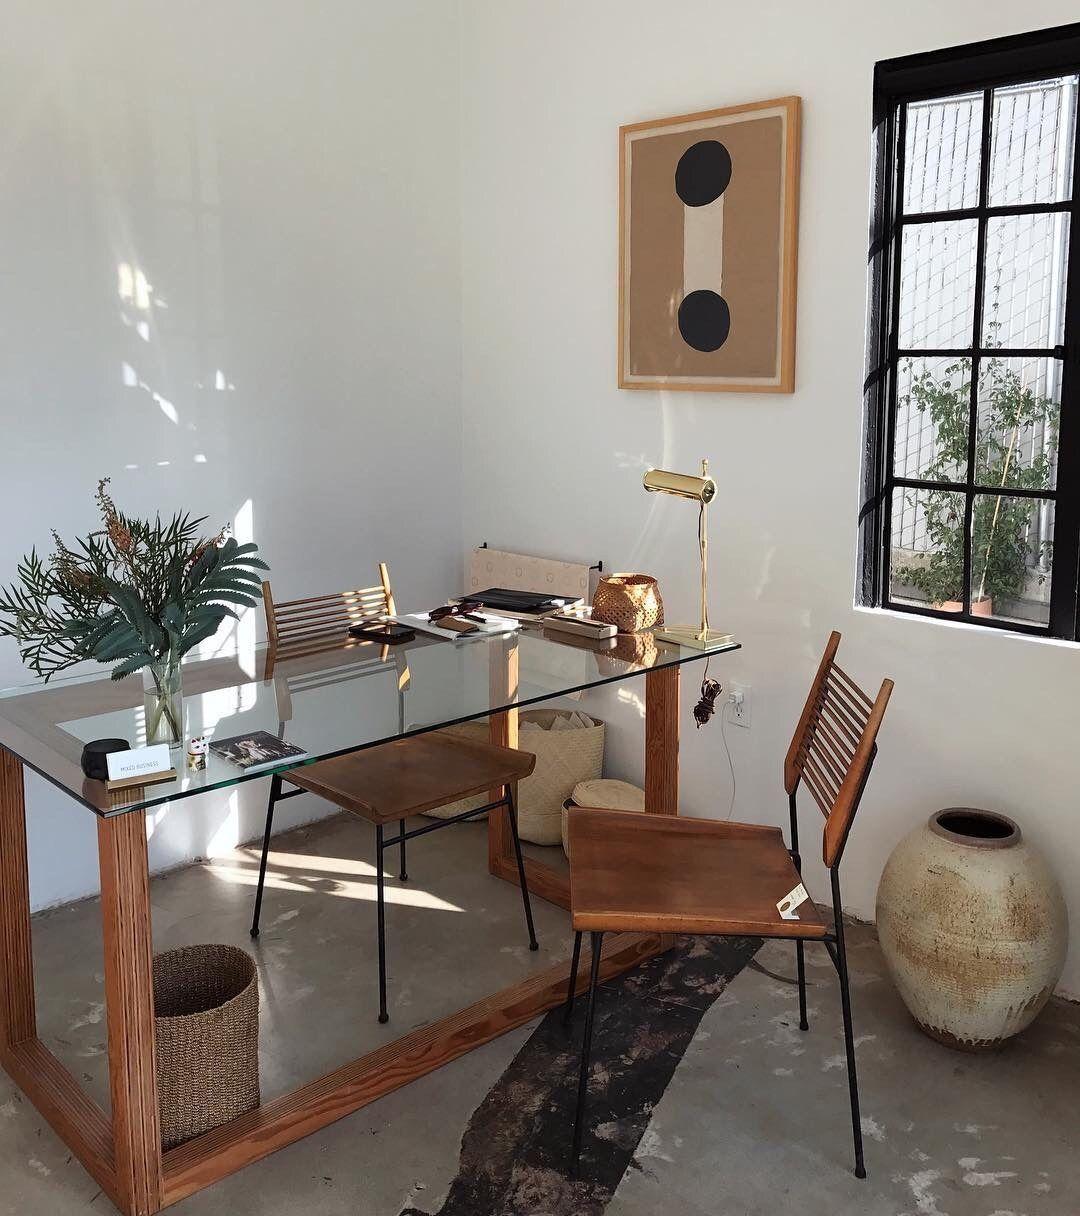 Modern bohemian home decor  we love fashion  Decor  Pinterest  Brown leather chairs Glass